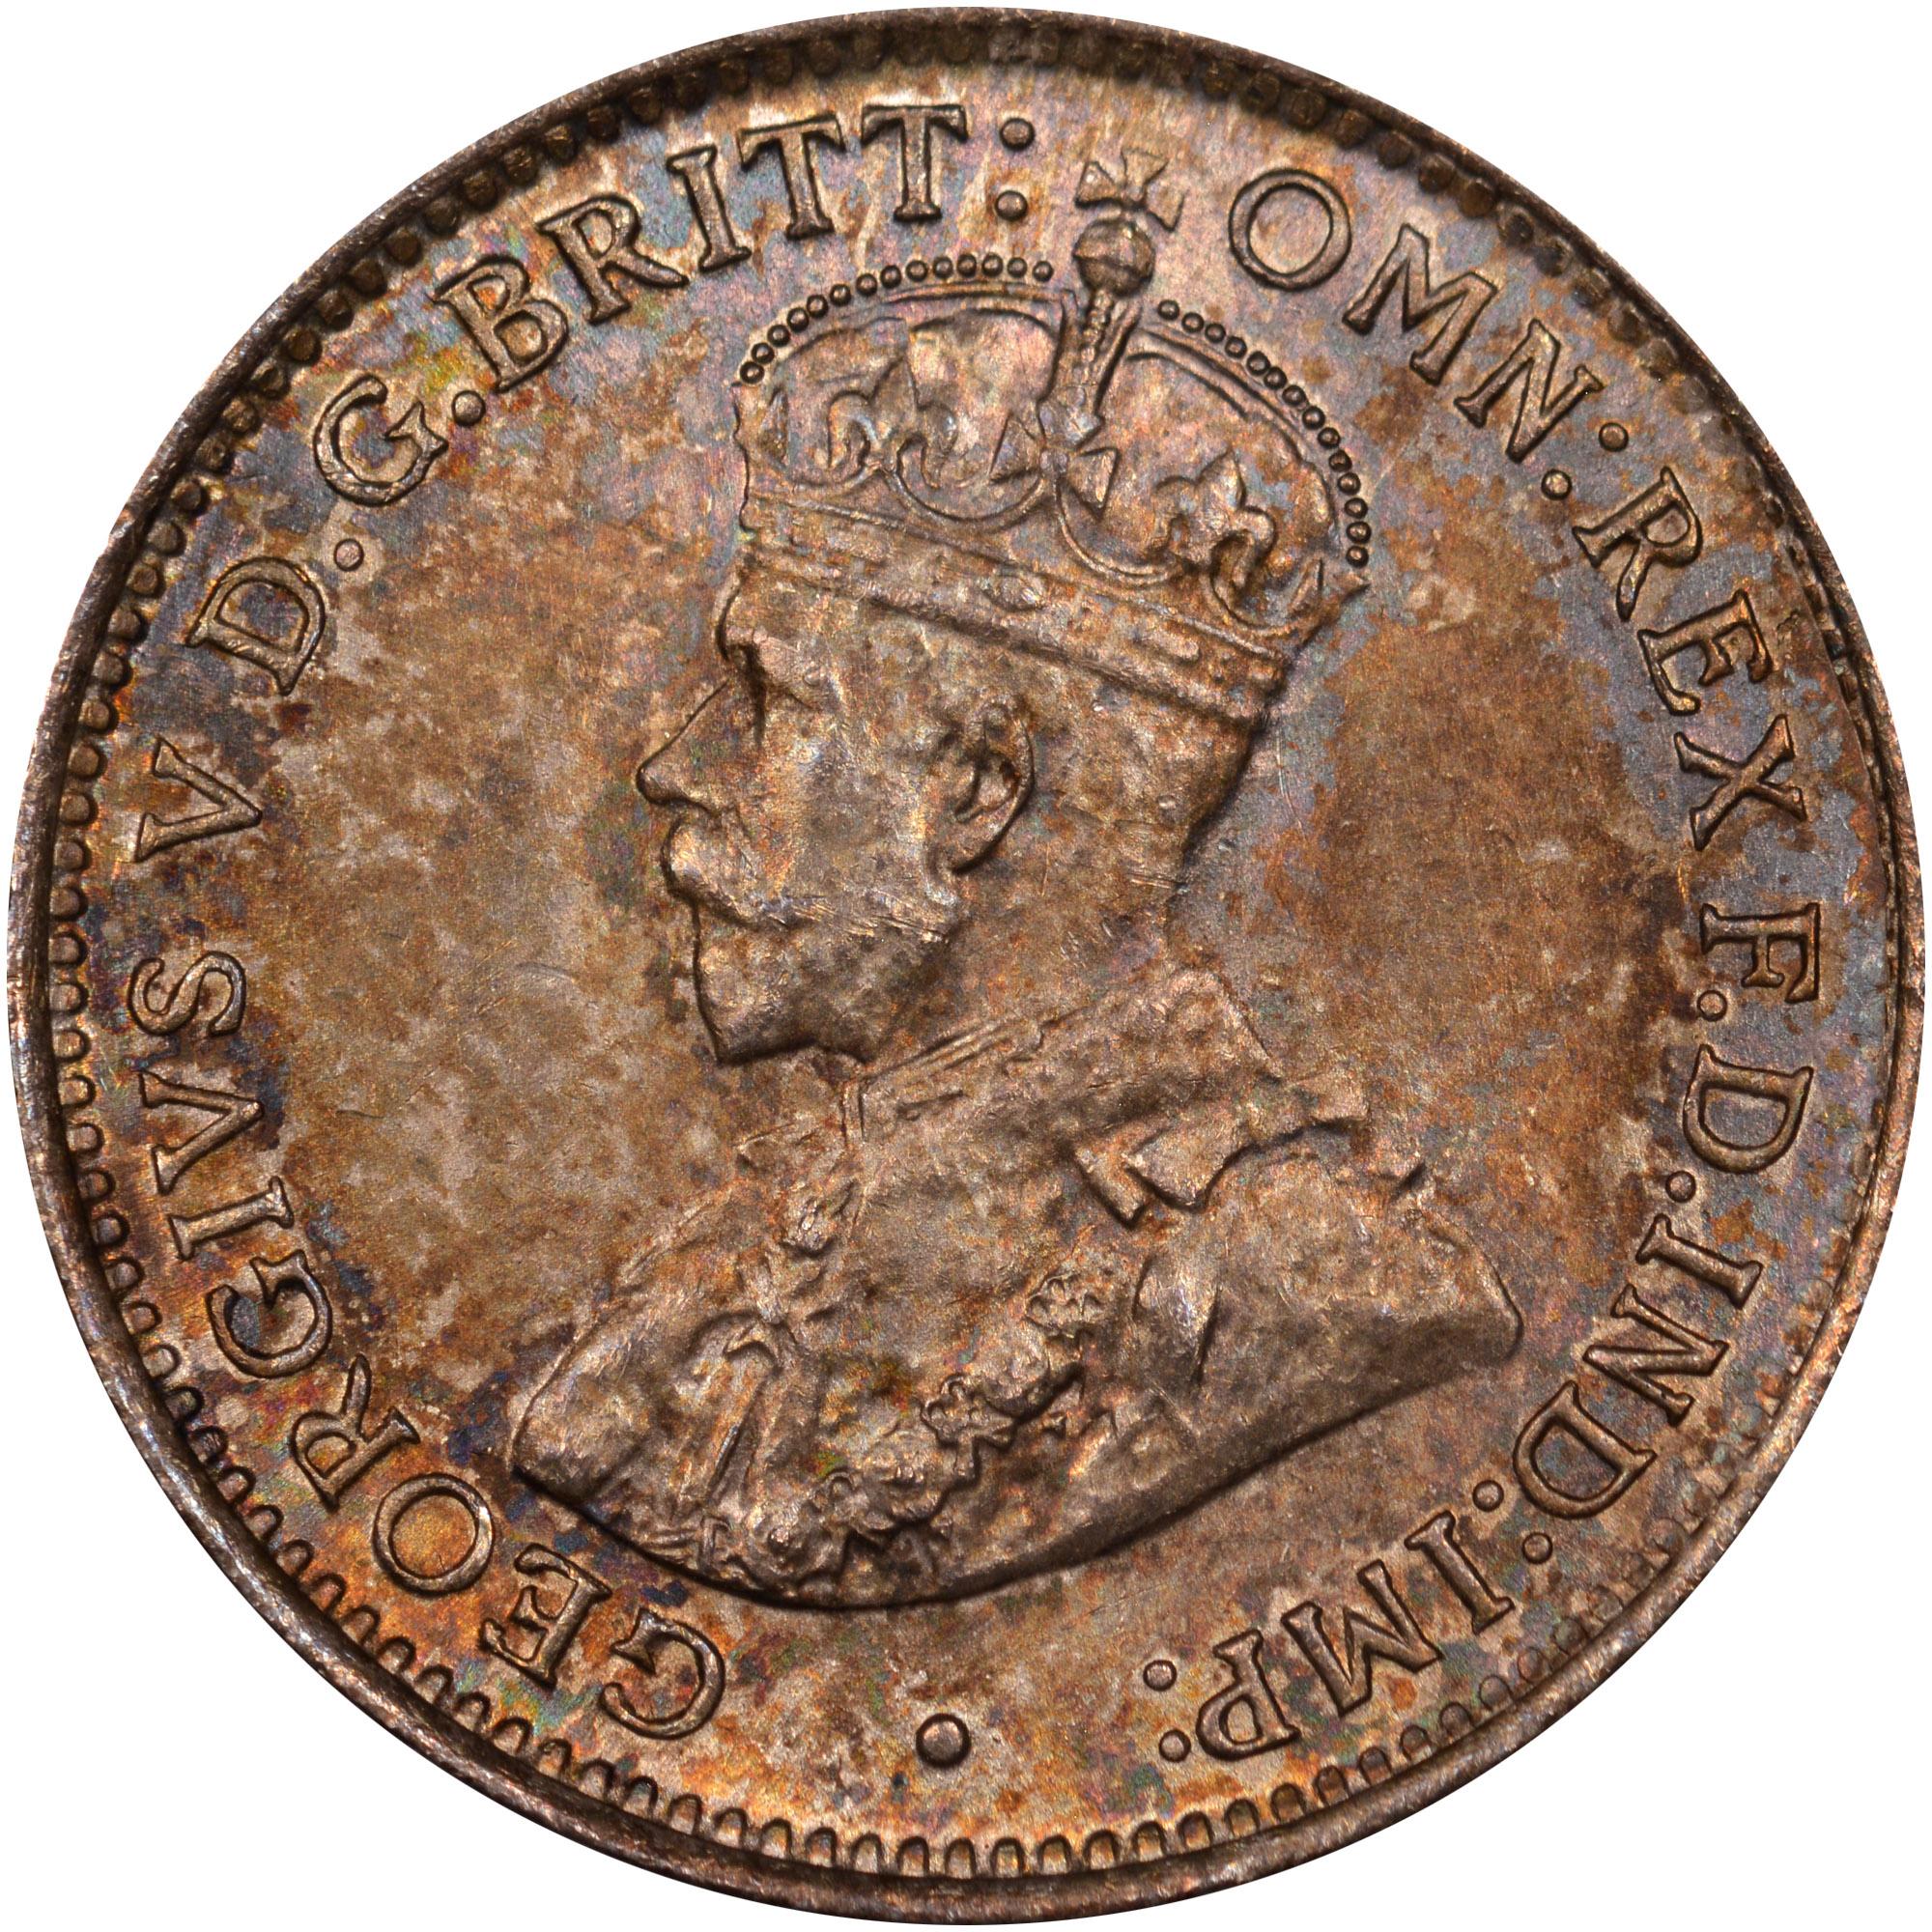 1913-1919 British West Africa 3 Pence obverse